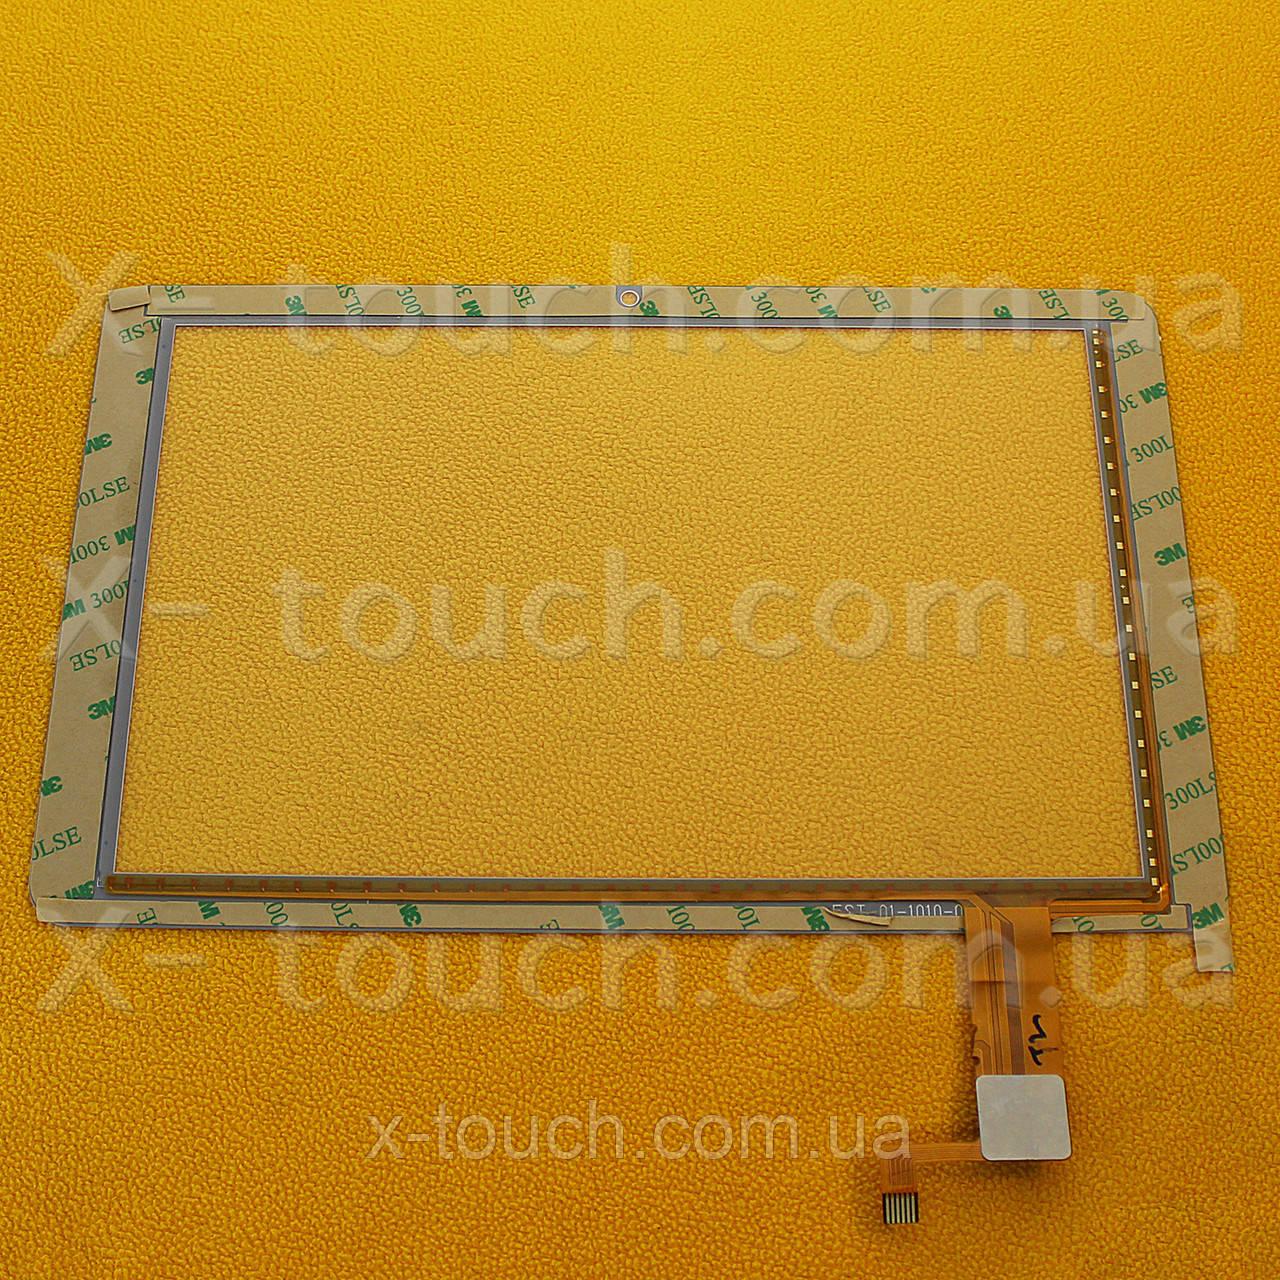 Тачскрин, сенсор 04-1010-0879 белый  для планшета